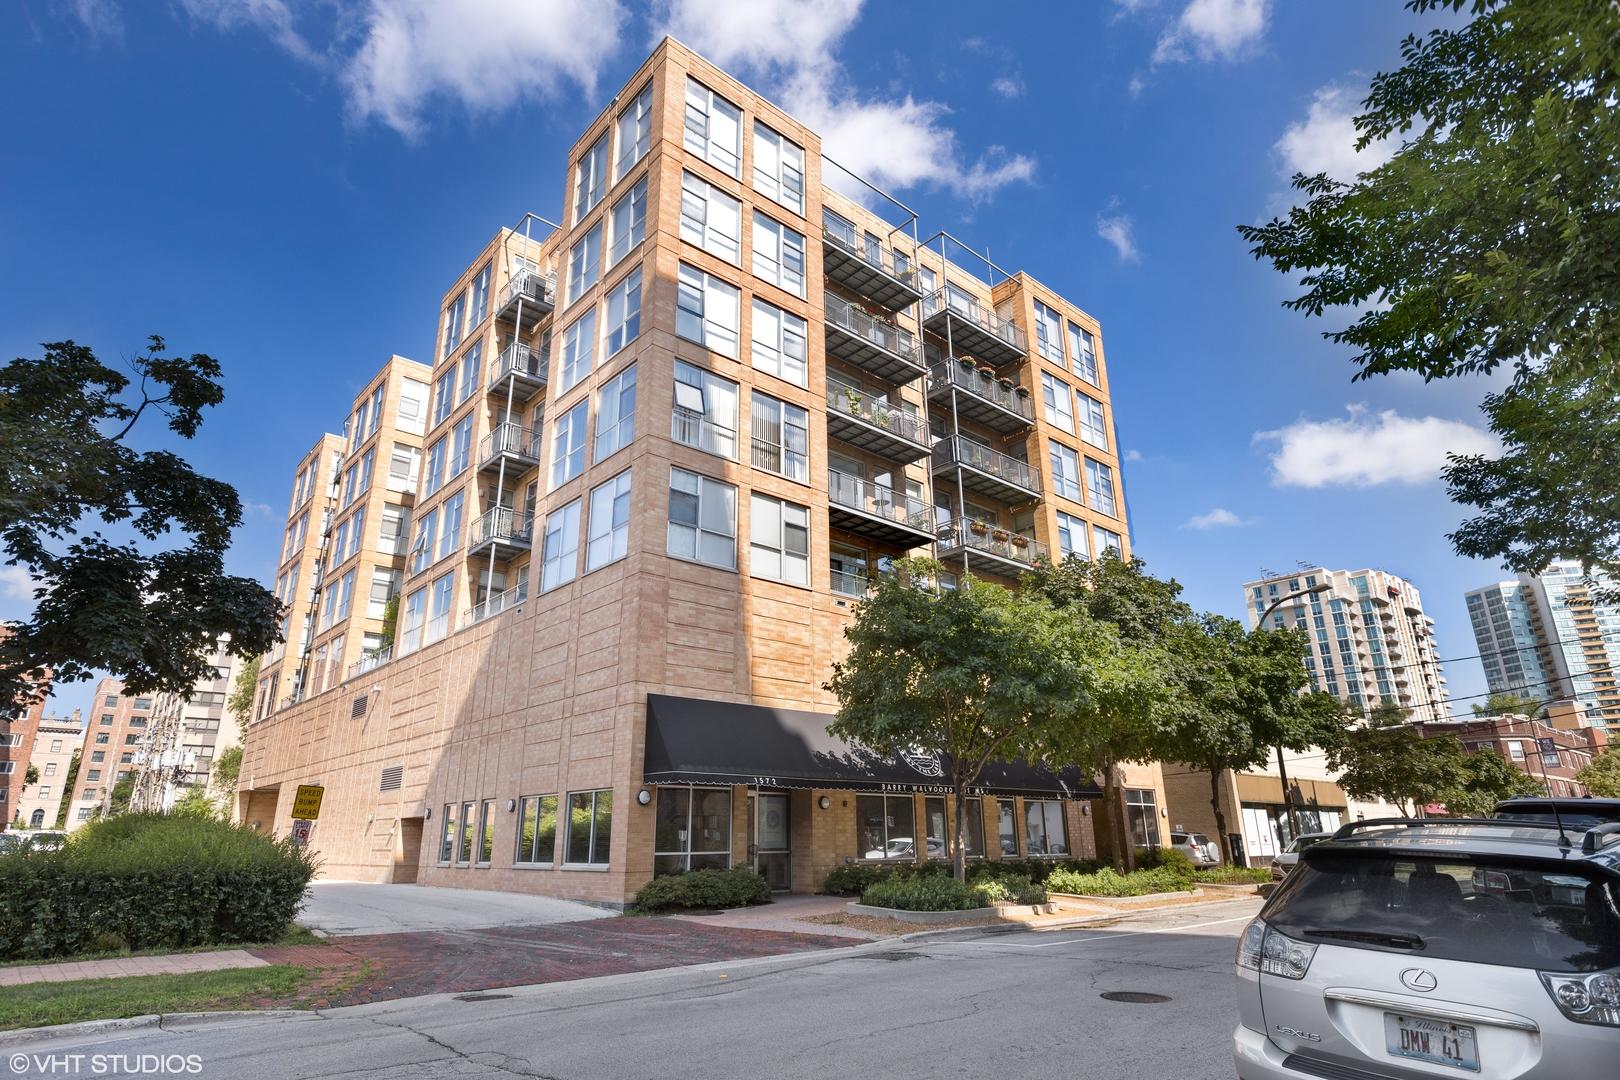 1572 Maple Avenue Unit 501, Evanston IL 60201